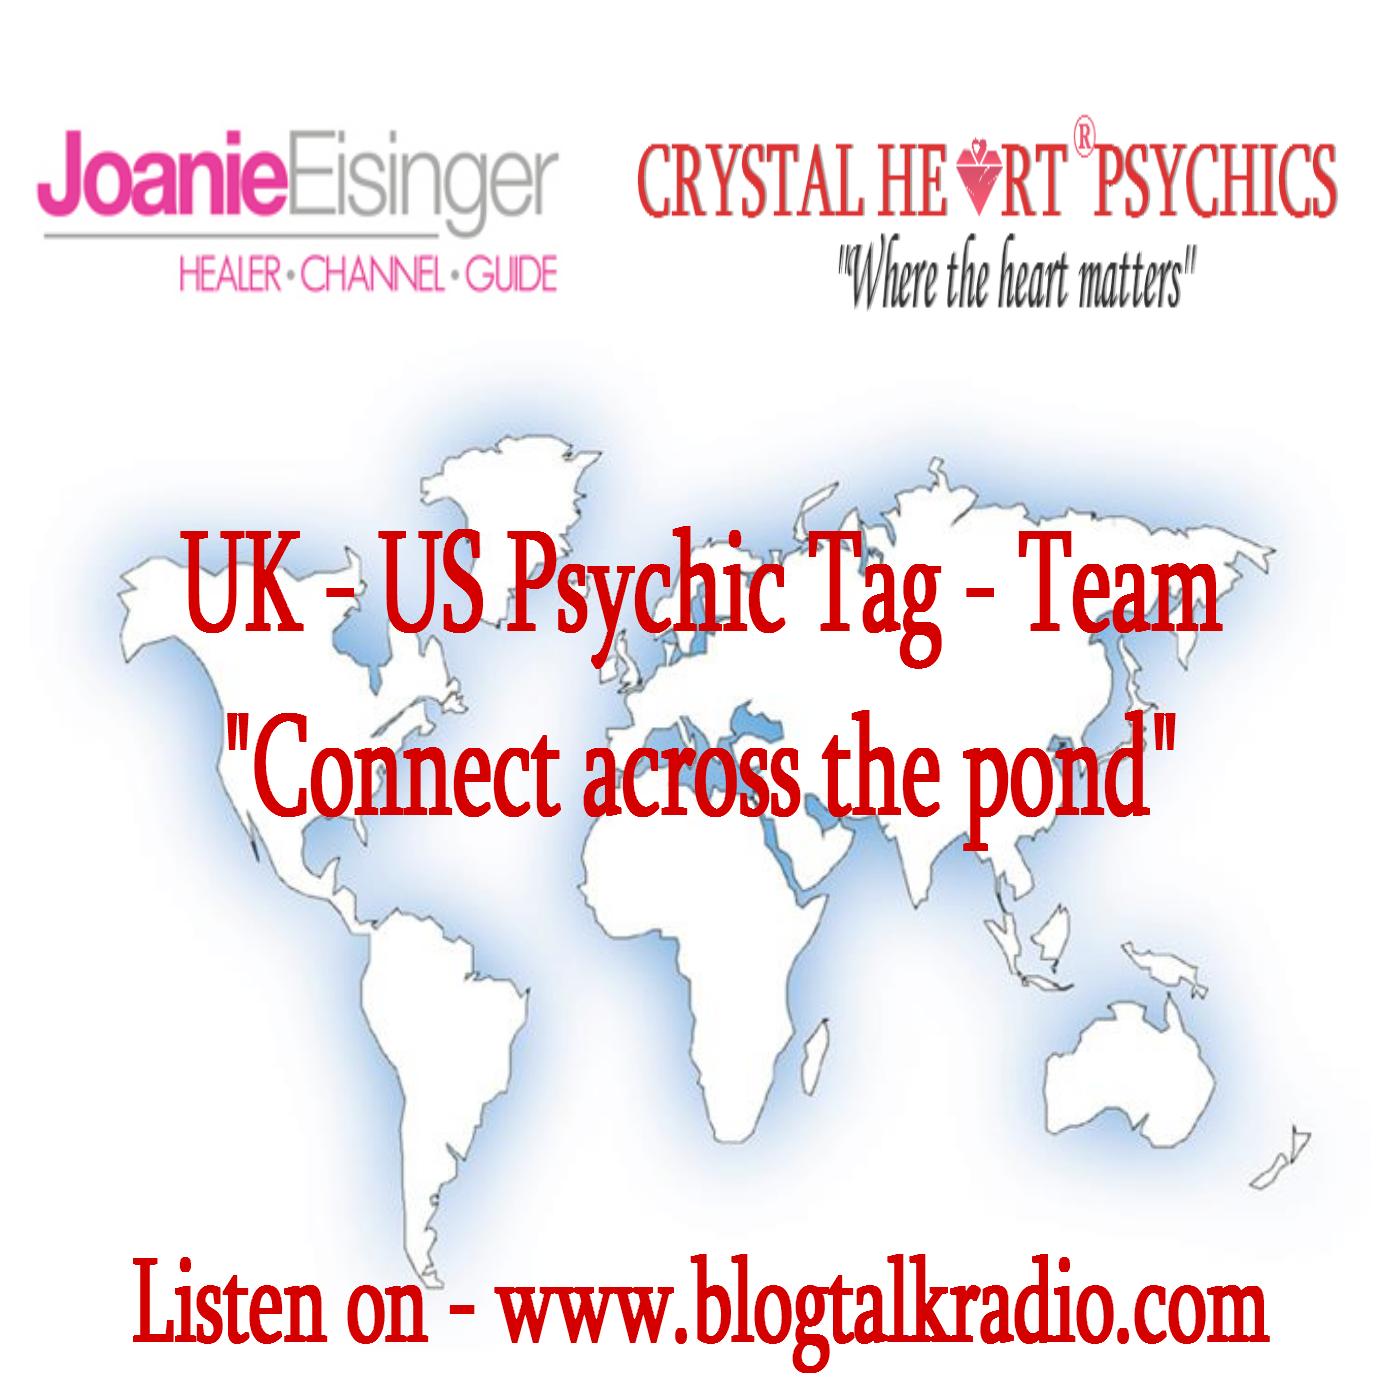 https://www.crystalheartpsychics.com/wp-content/uploads/2016/11/Blog-1400.1400.png